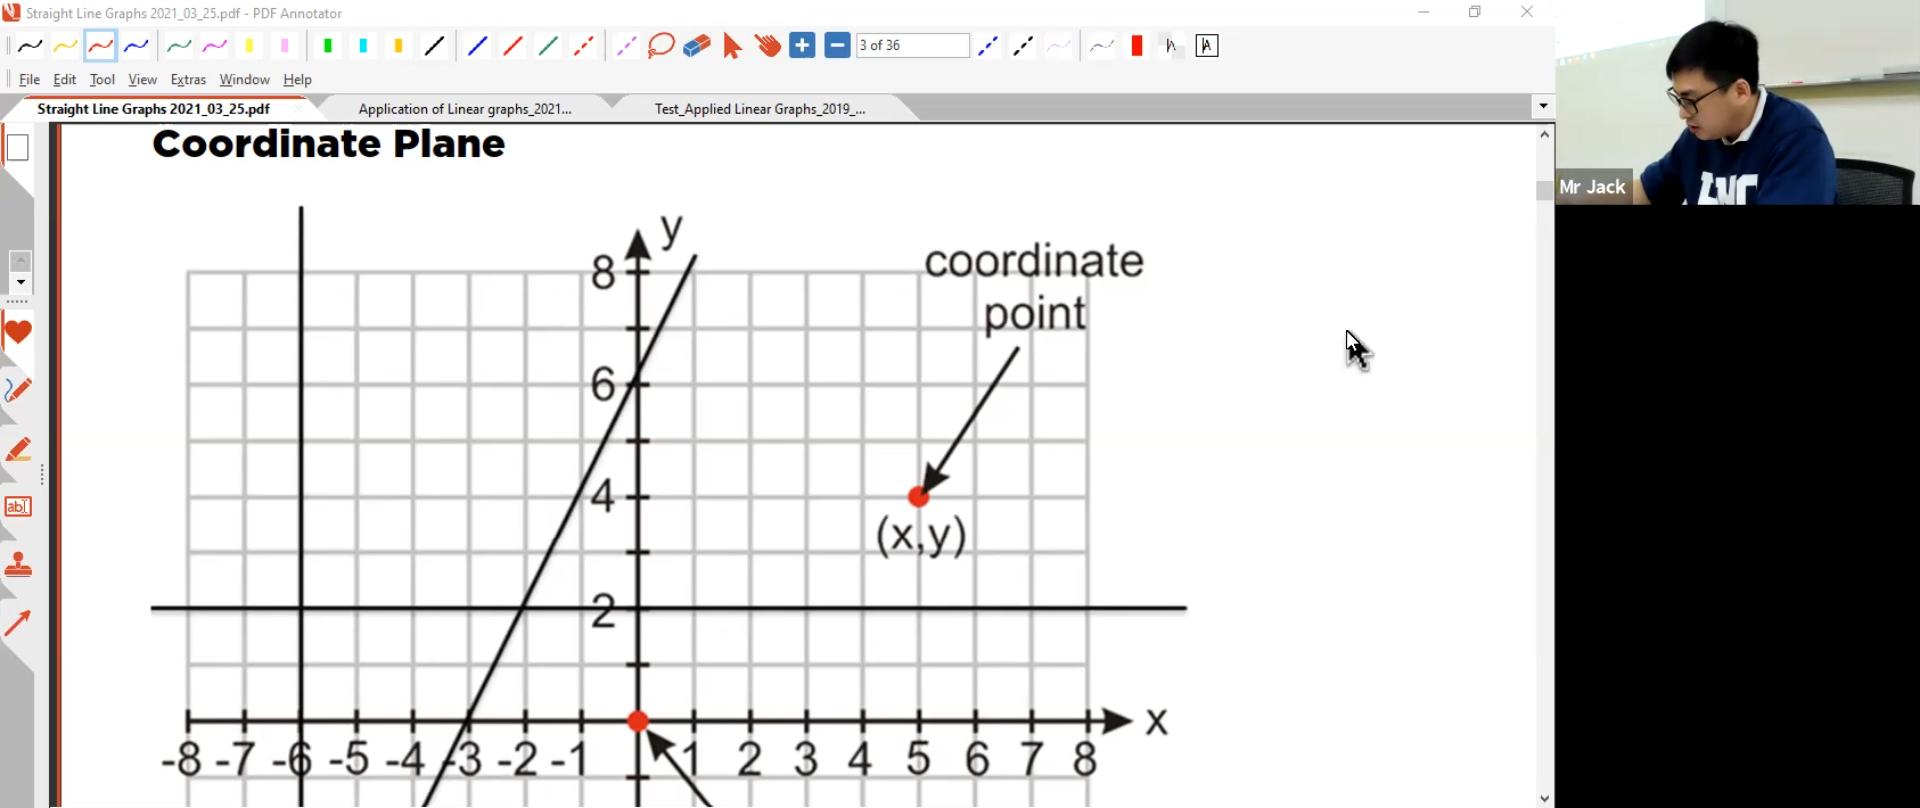 20. Linear Graphs 2